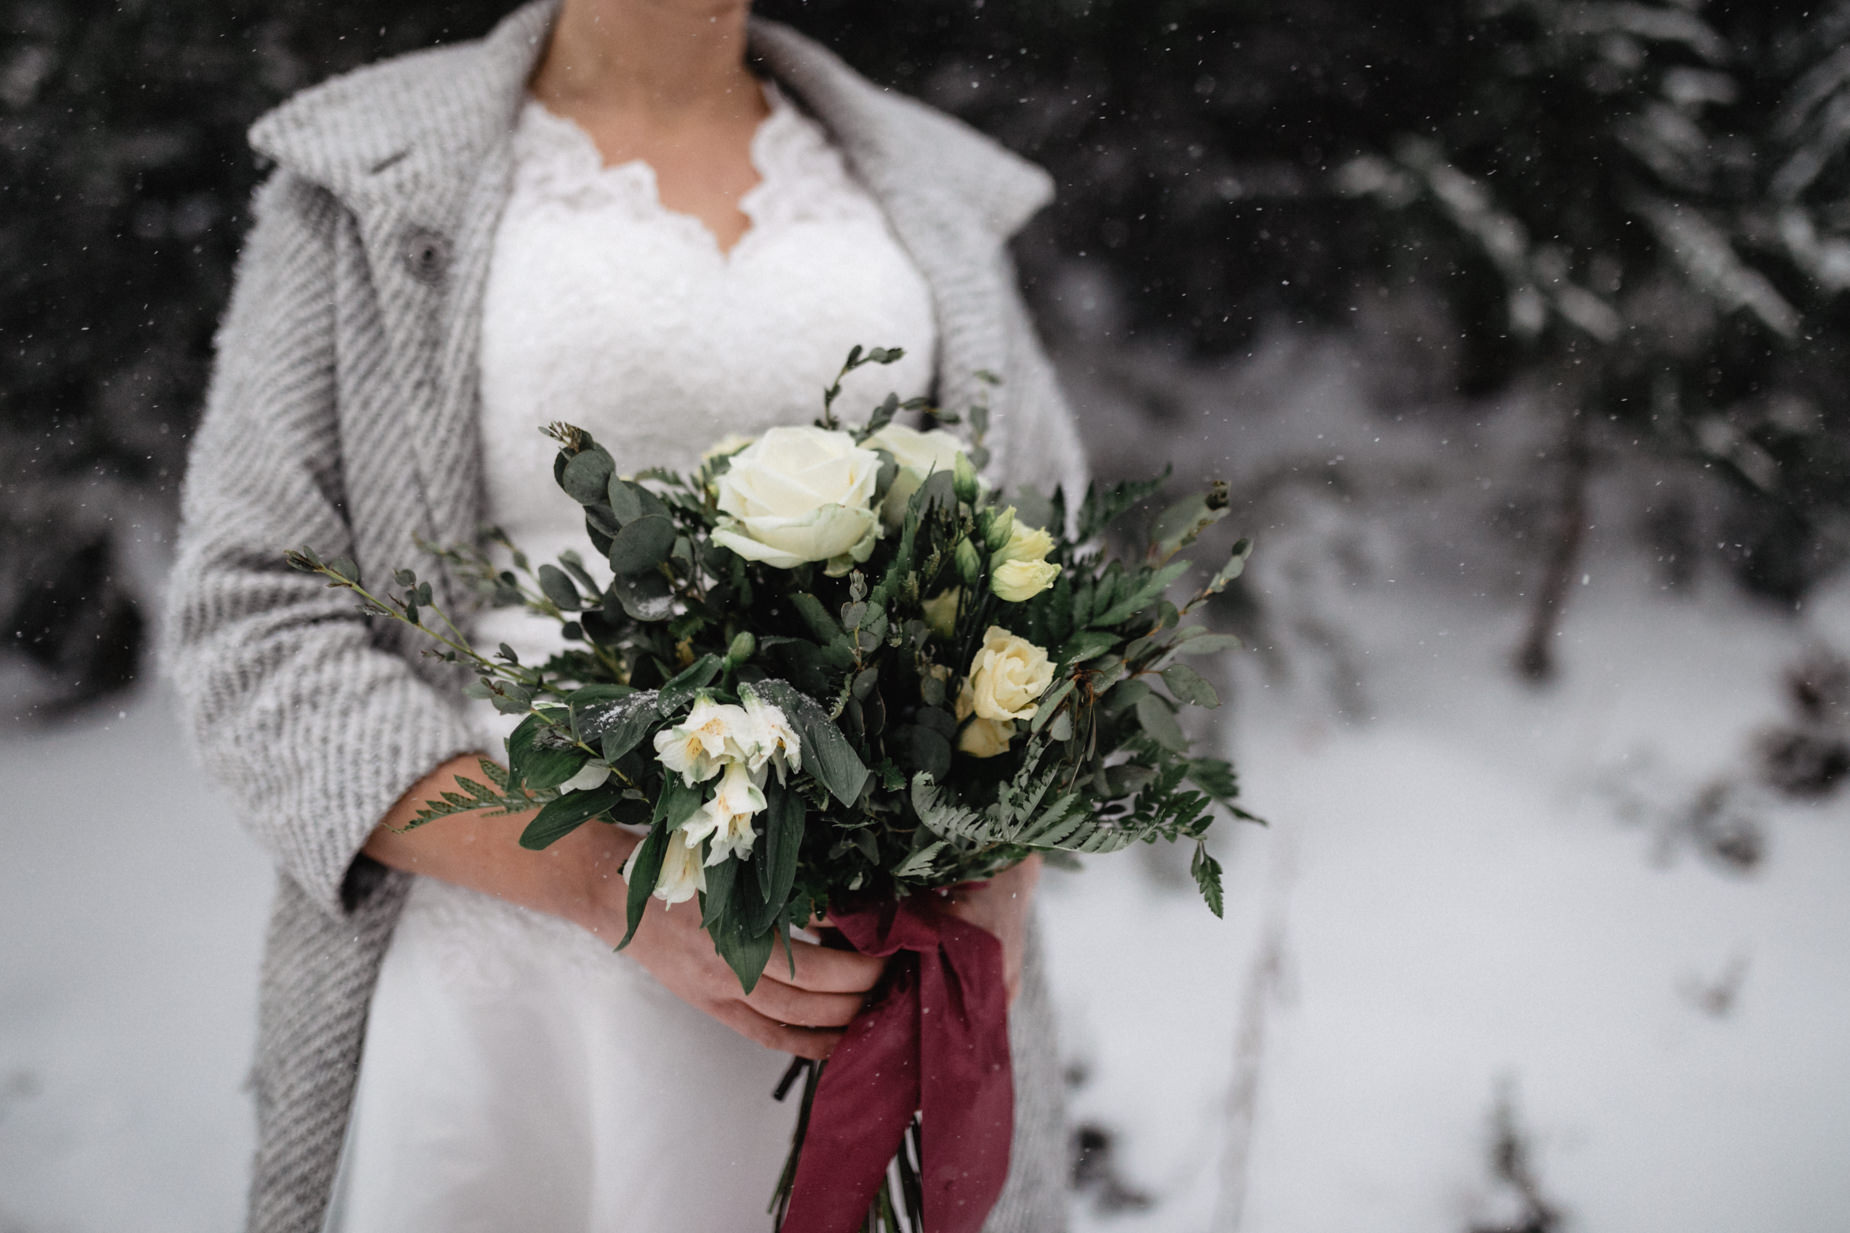 BlackForest-Wedding-Snow-Basel-Destinatonwedding-Hochzeitsfotograf-17.jpg